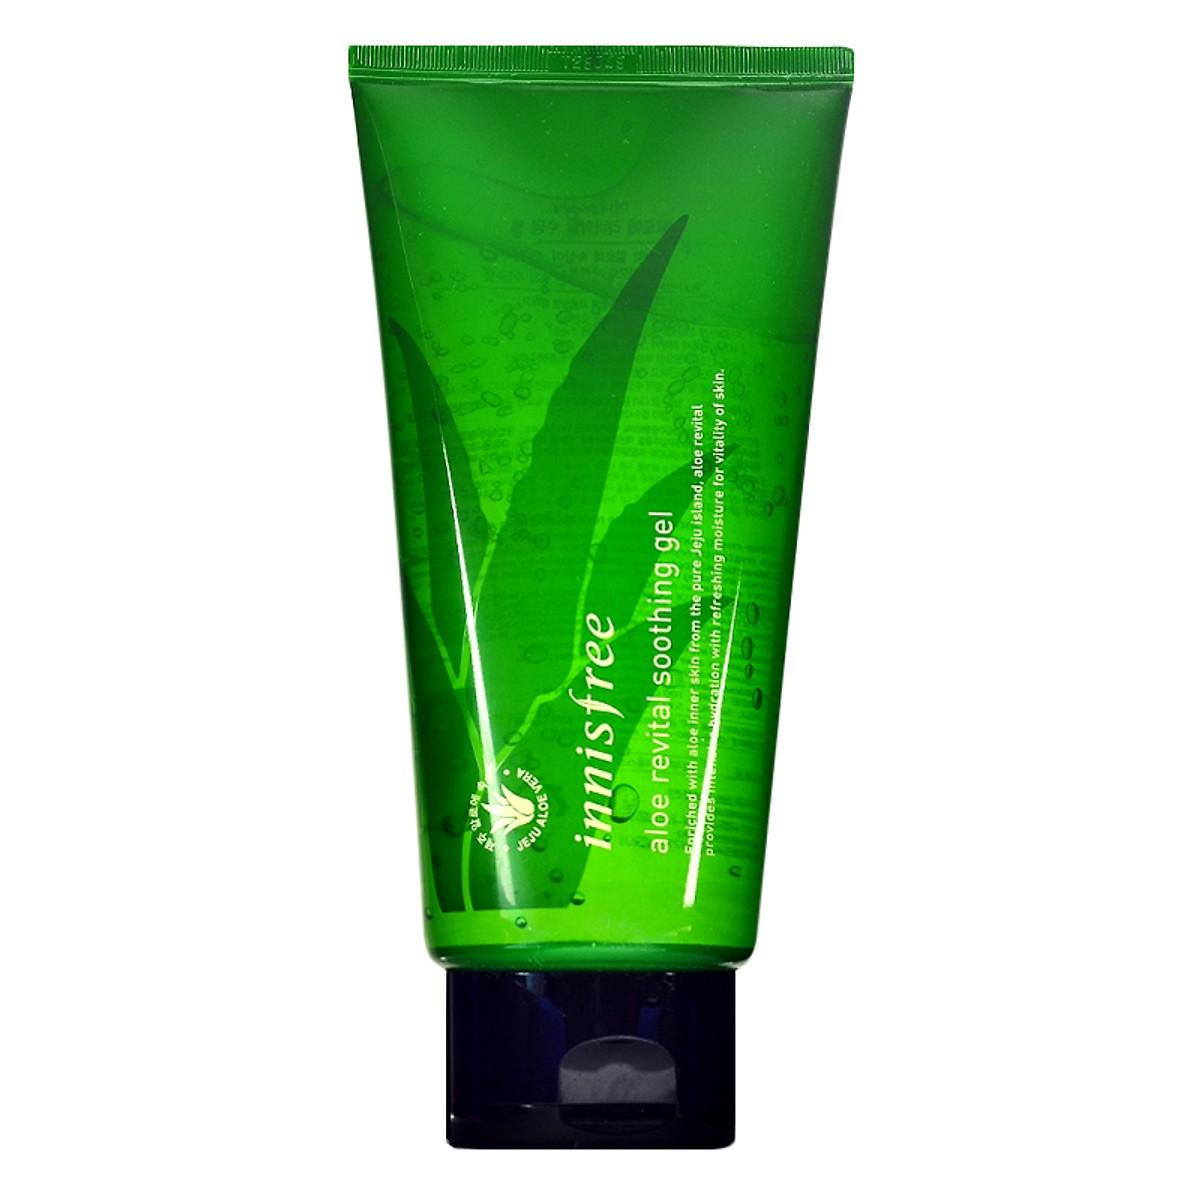 Kem dưỡng ẩm cho da dầu Innisfree Aloe Revital Soothing 300ml